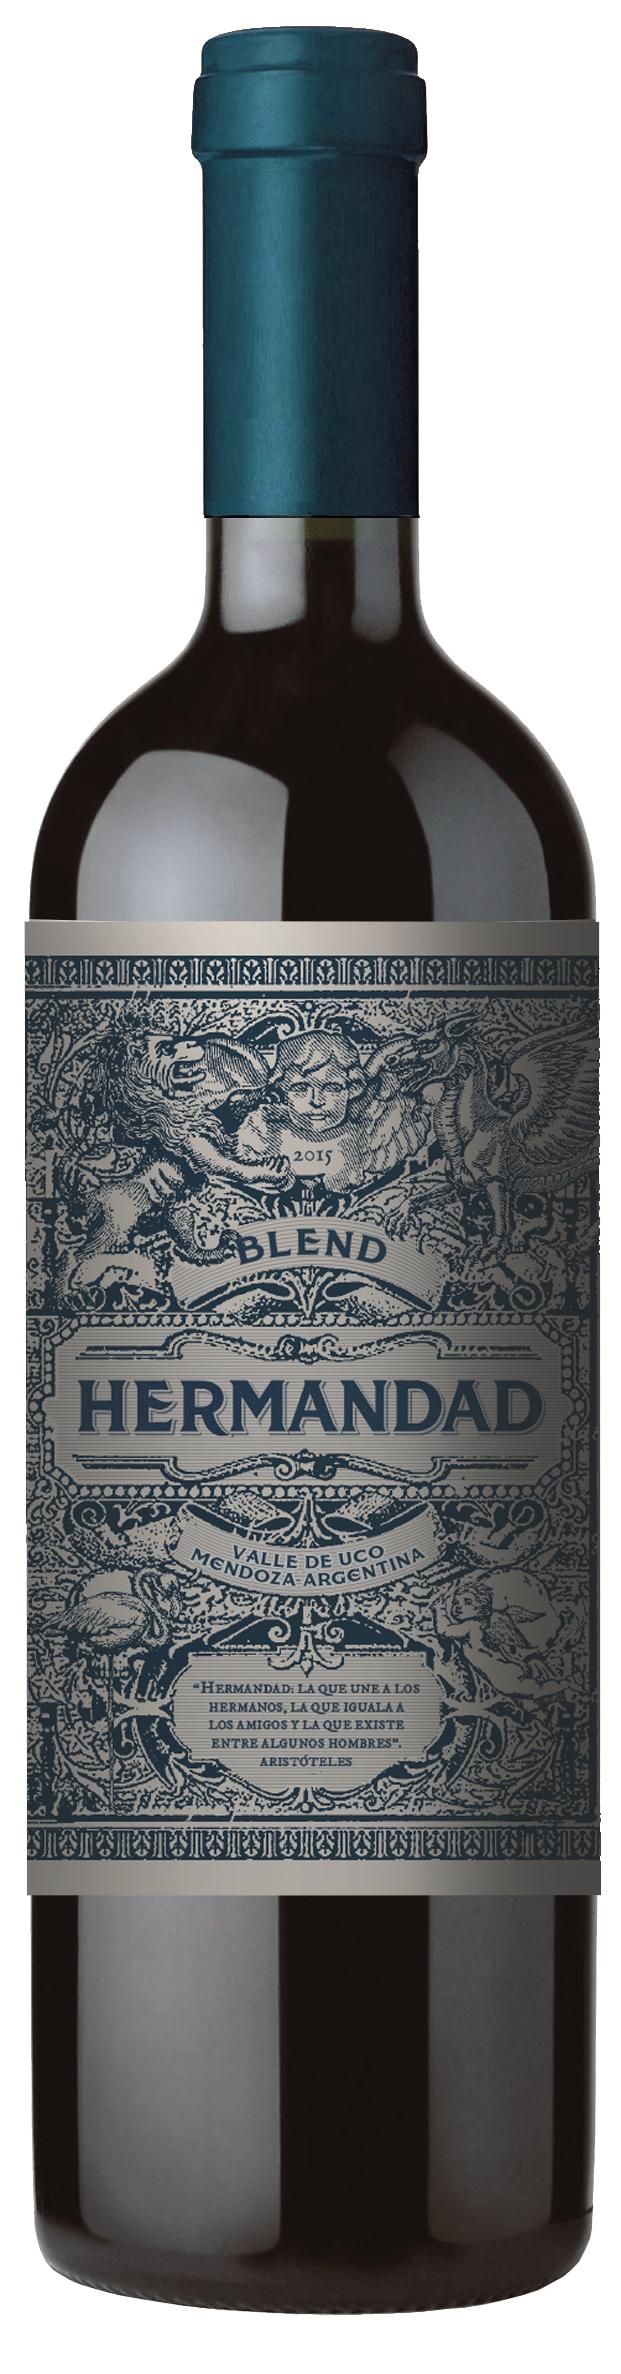 Hermandad Blend (Malbec, Cab Sav, Merlot & Petit Verdot)